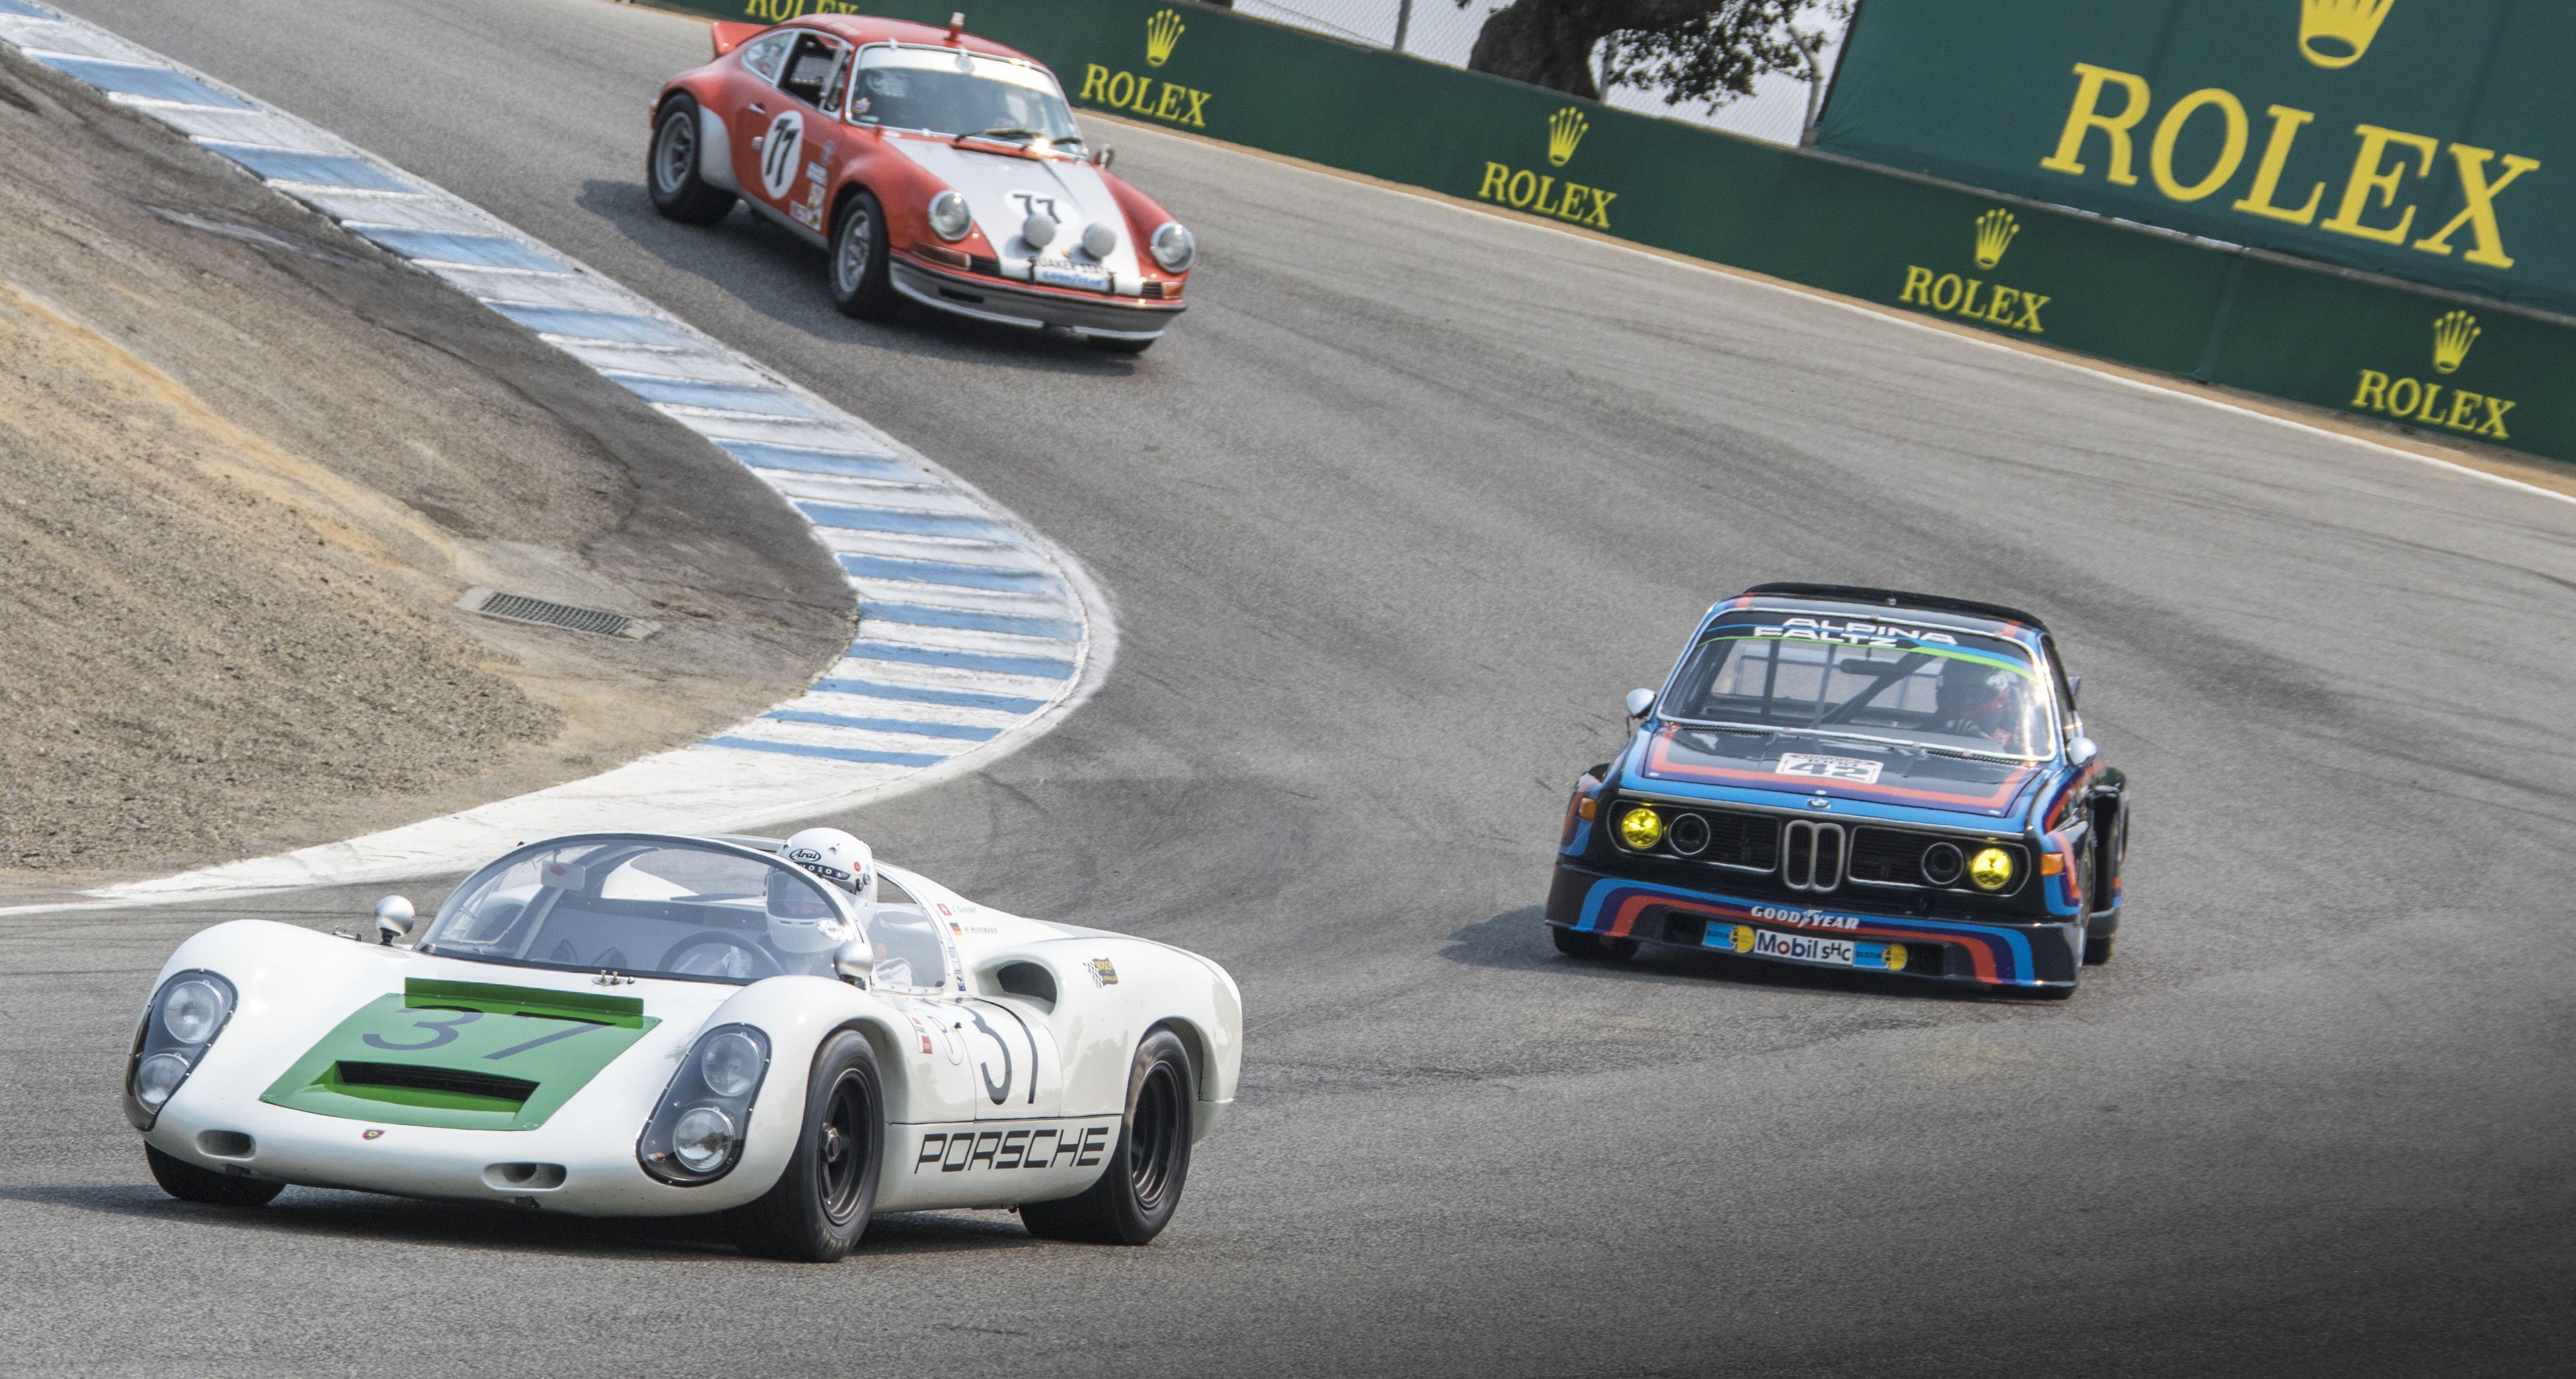 Cool Cars at Mazda Raceway Laguna Seca 2017 - Photos